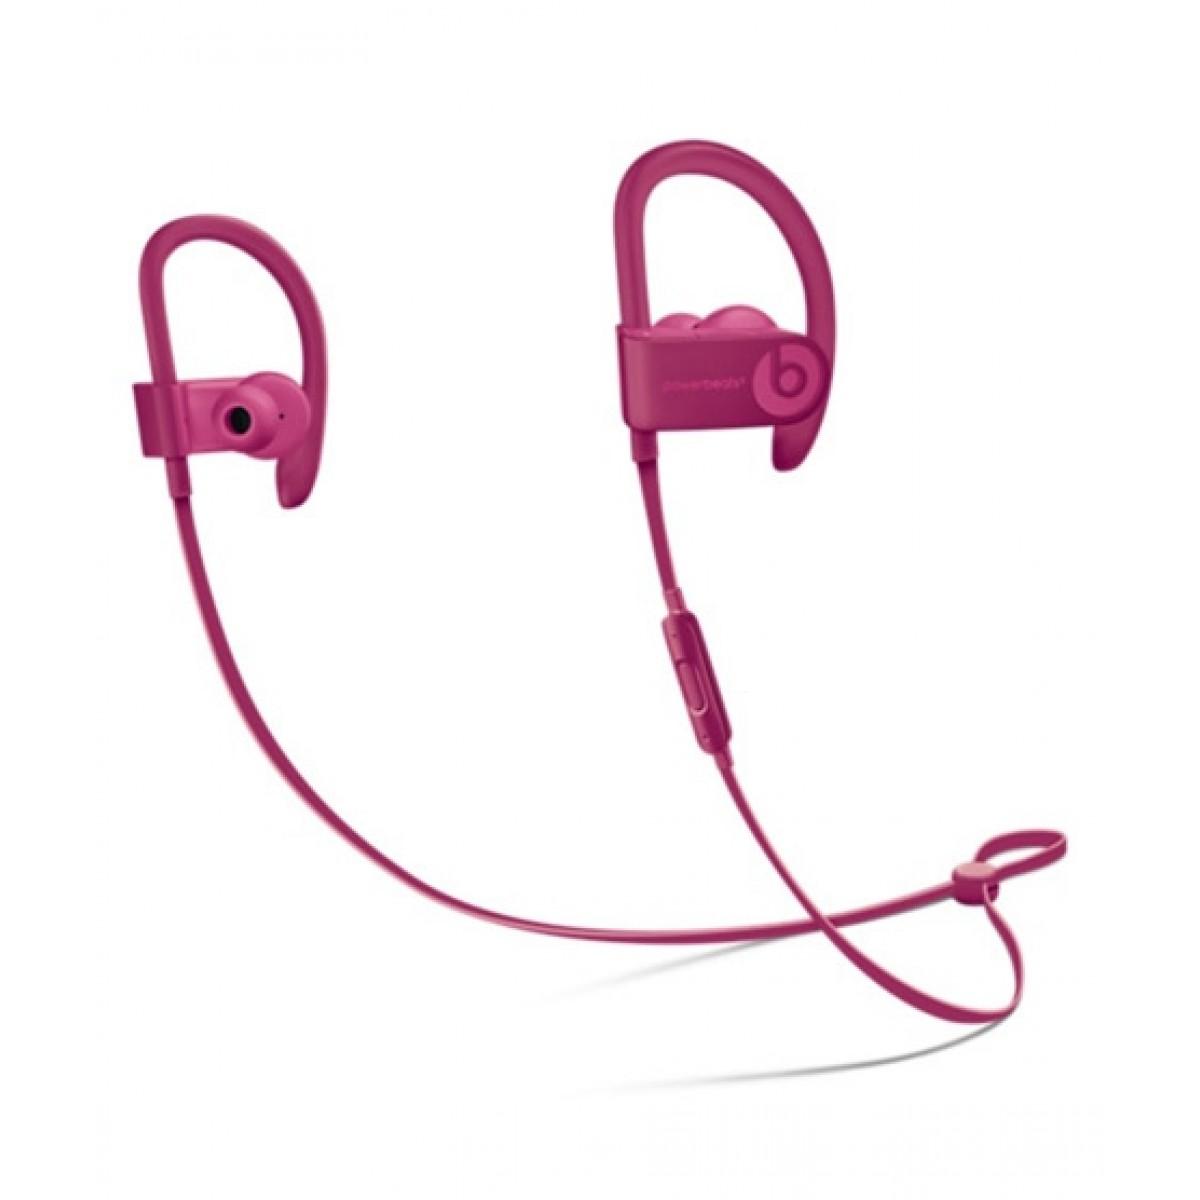 e27b2871bd3 Beats Powerbeats3 Wireless Earphones Price in Pakistan | Buy Beats  Neighborhood Collection Bluetooth Earphones Brick Red | iShopping.pk